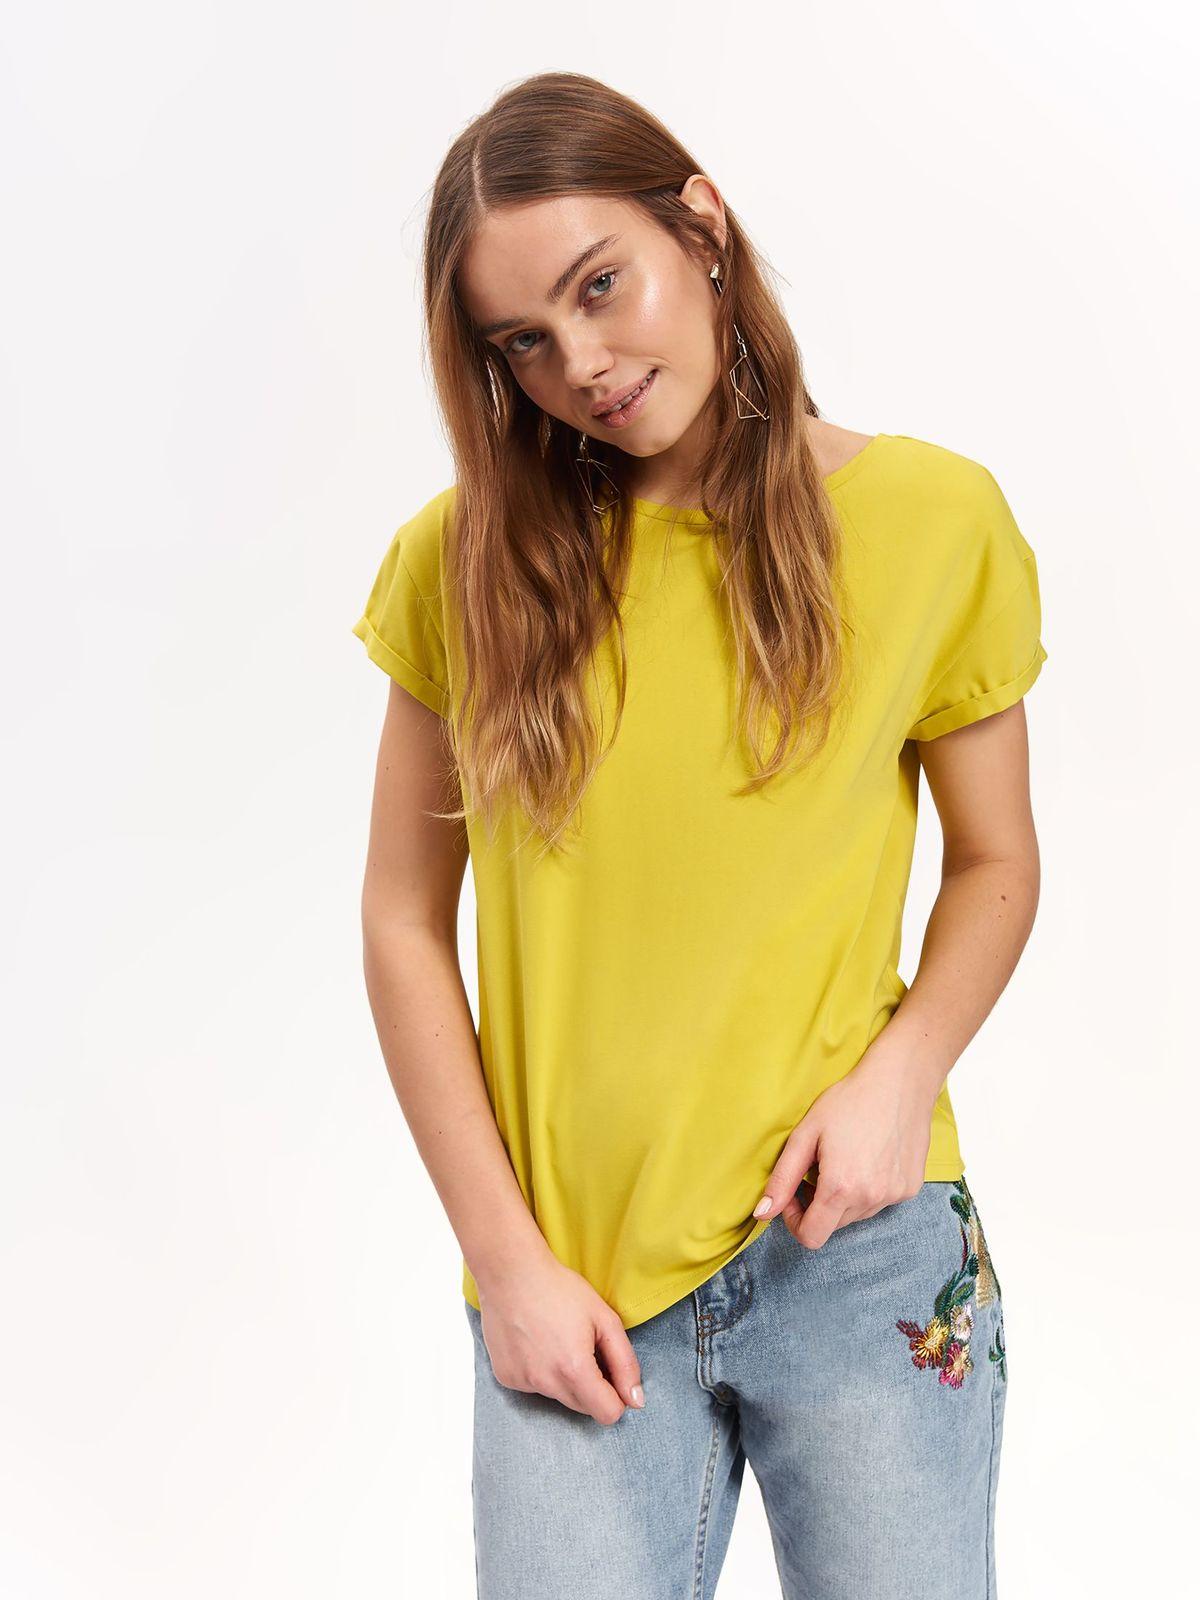 6f9cb78b13ee TOP SECRET γυναικειο t-shirt με χιαστη πλατη